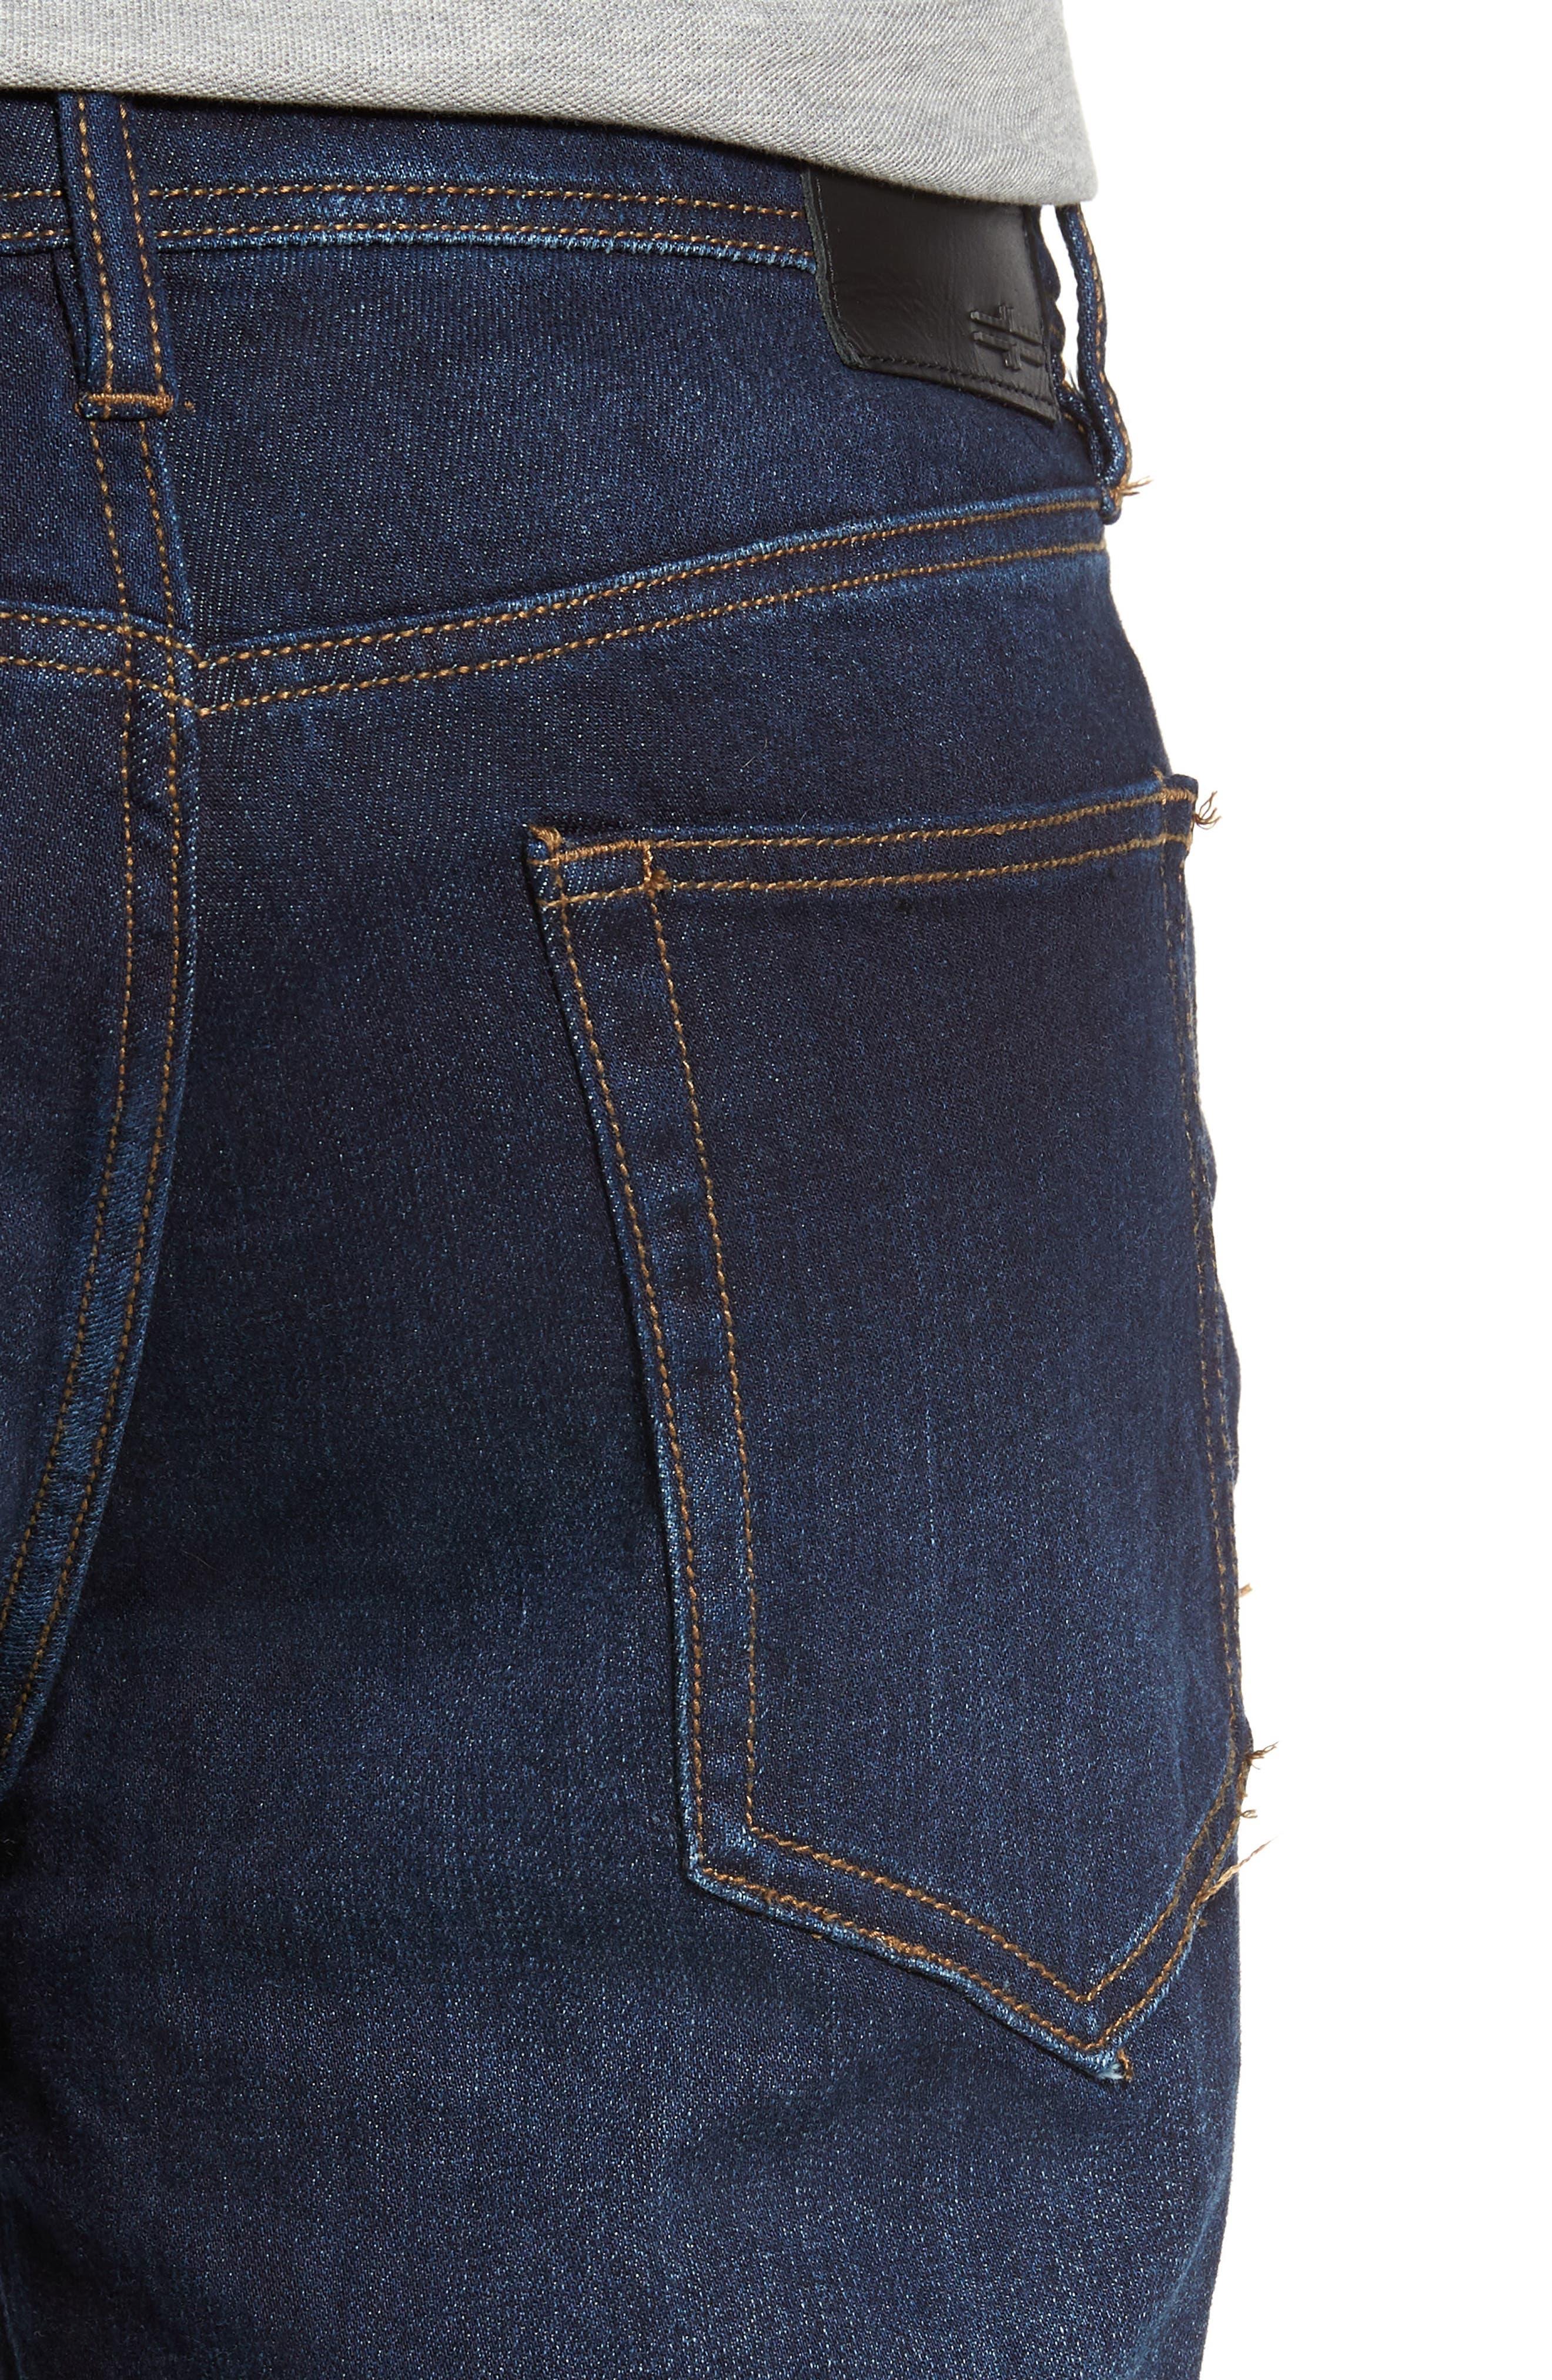 Jeans Co. Regent Relaxed Fit Jeans,                             Alternate thumbnail 4, color,                             SAN ARDO VINTAGE DARK